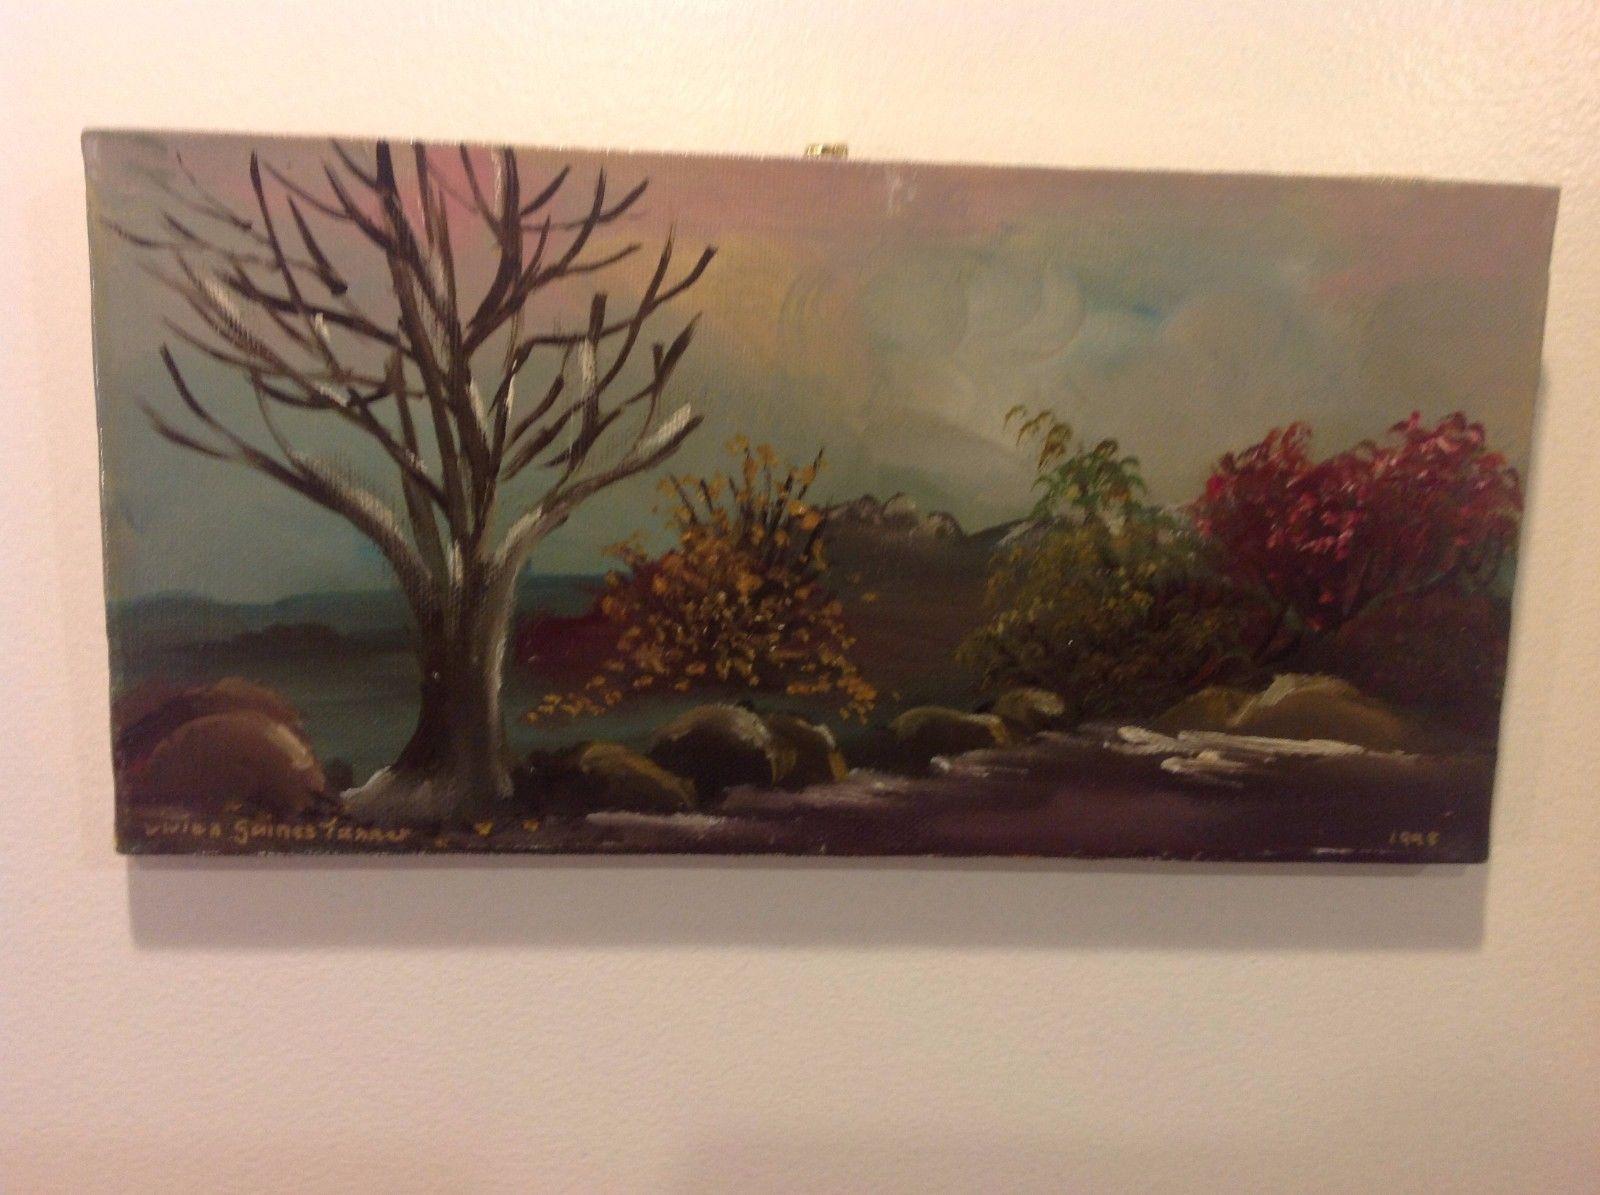 Painting Original Nature Tree Vivian Gaines Tanner Hudson Valley artist